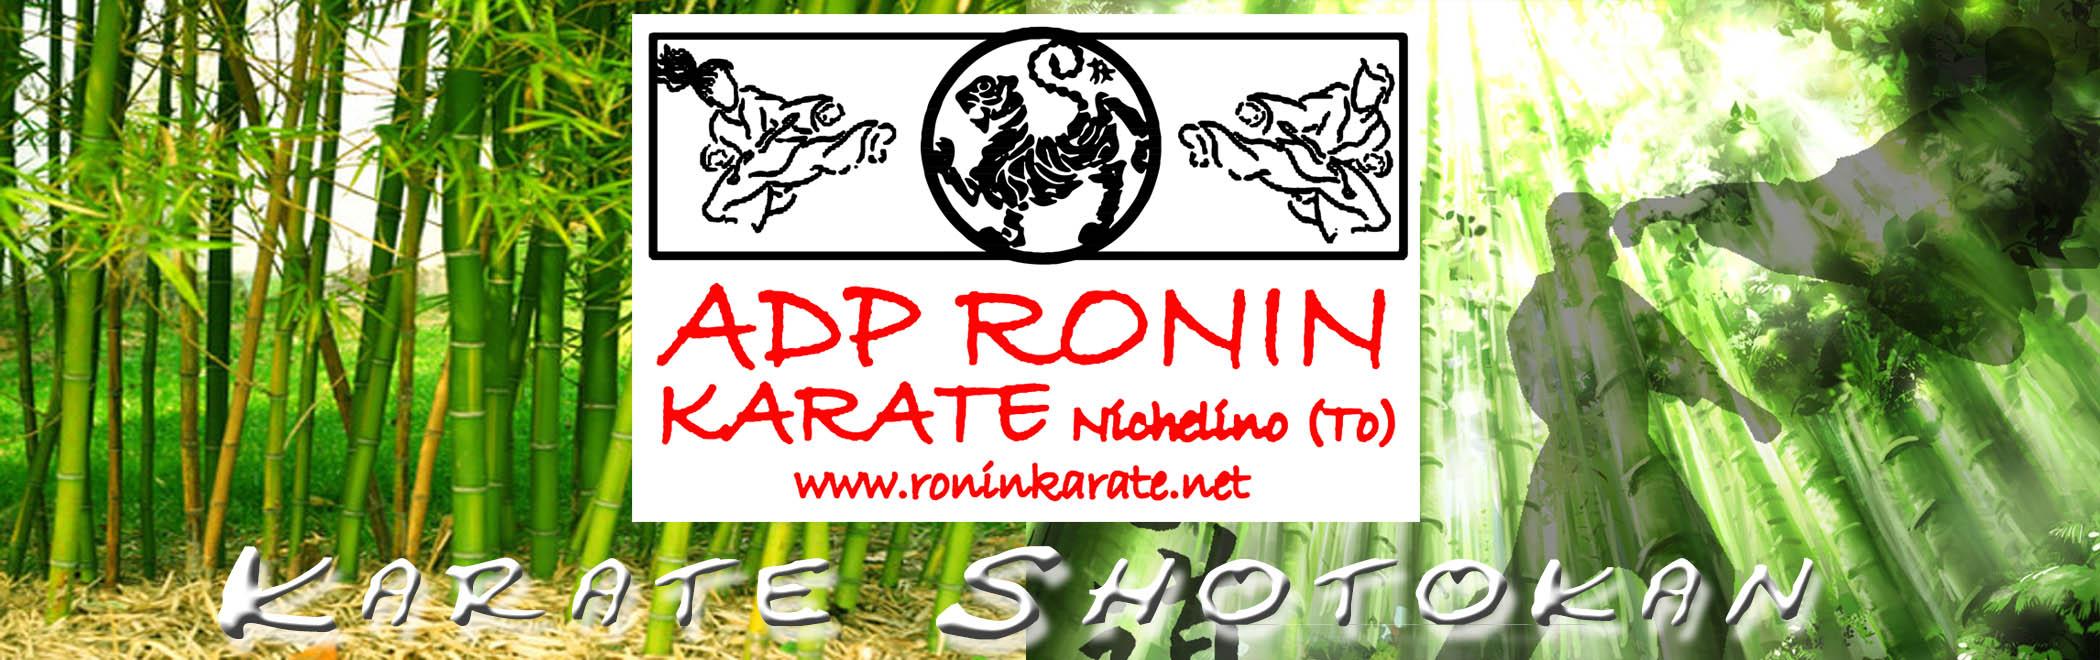 ADP RONIN KARATE Nichelino